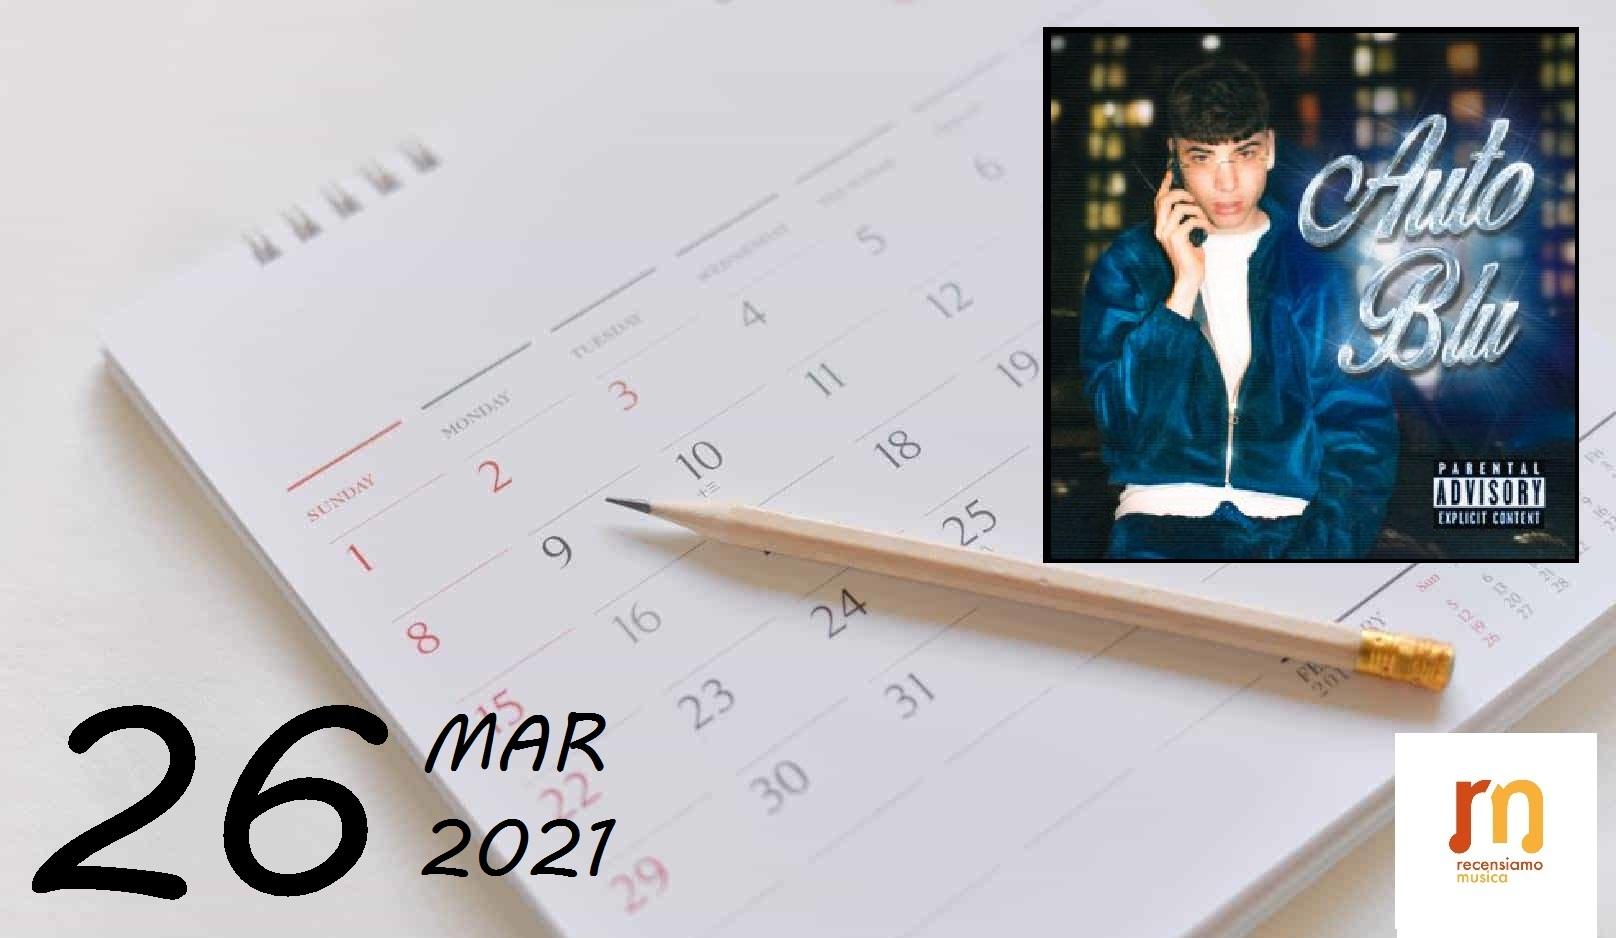 26 marzo